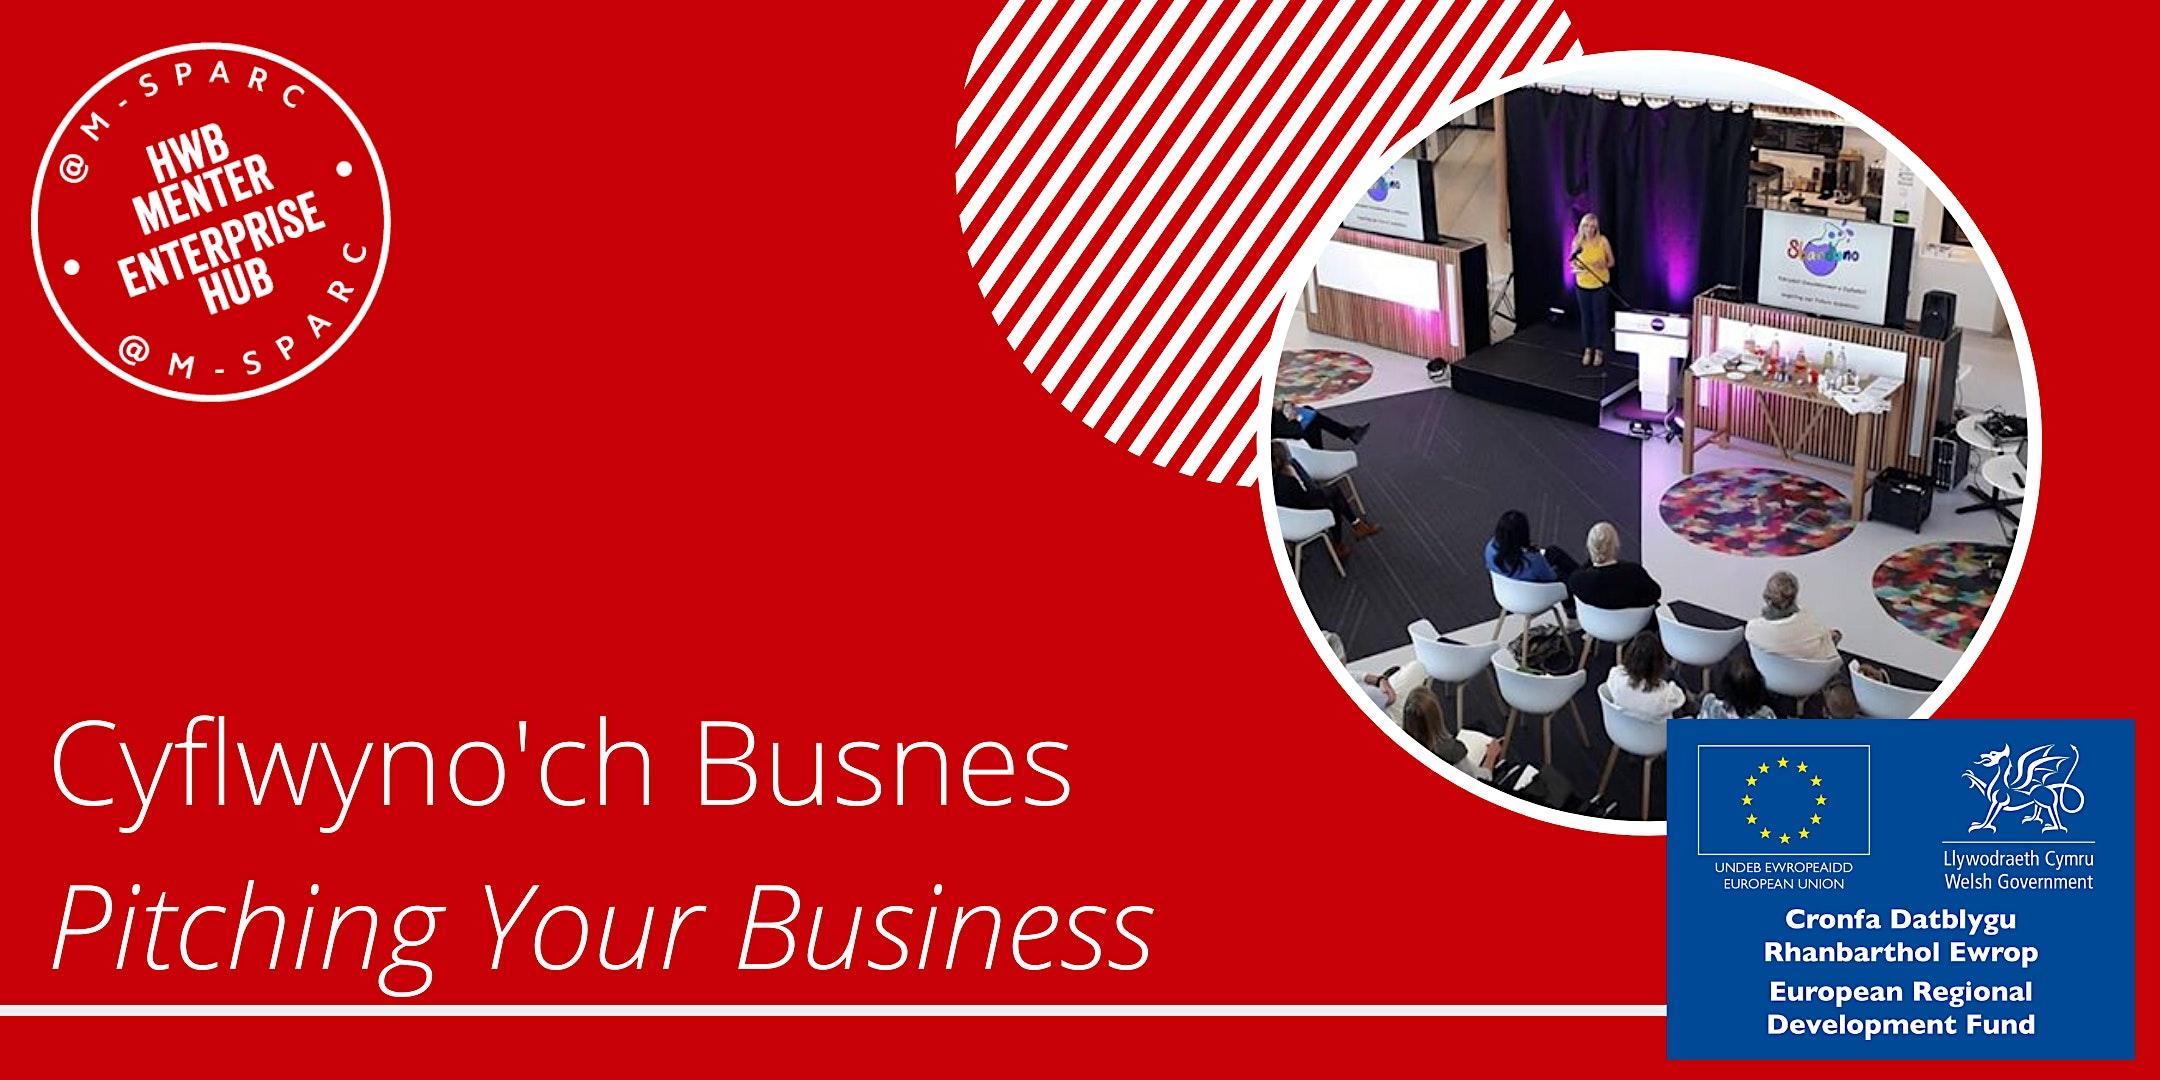 Covid-19: Cyflwyno'ch Busnes / Pitching Your Business